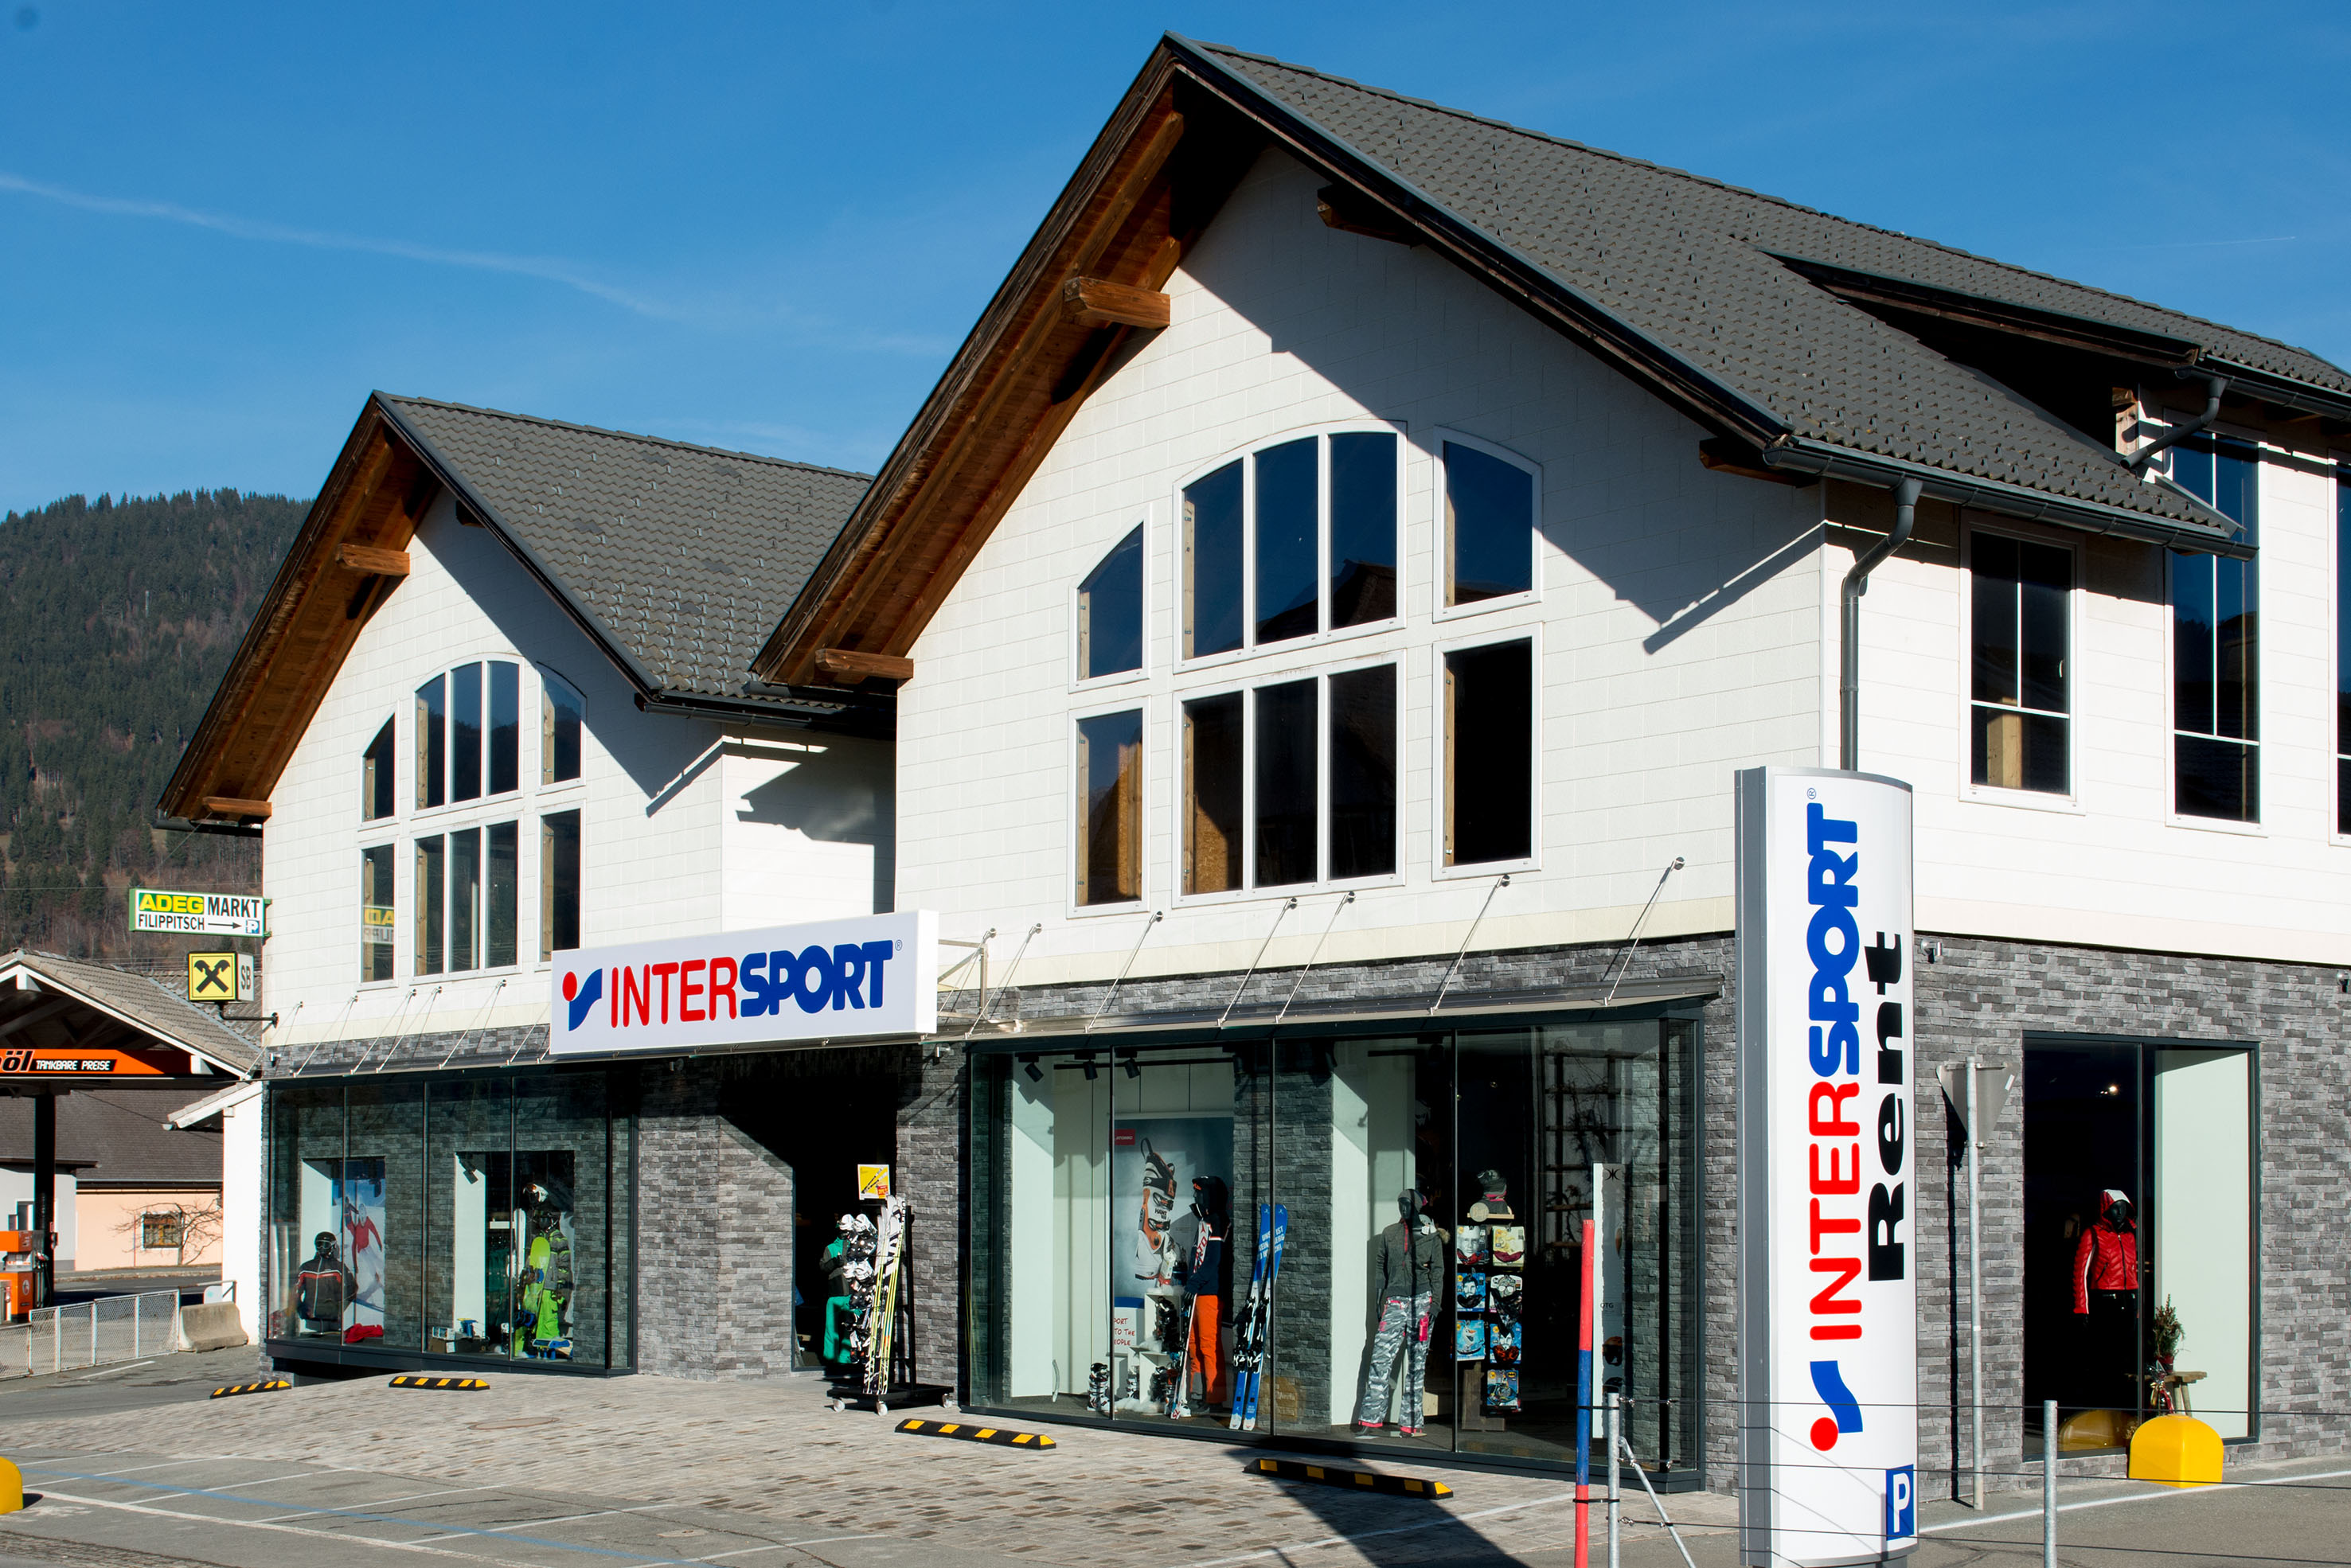 INTERSPORT Alpensport